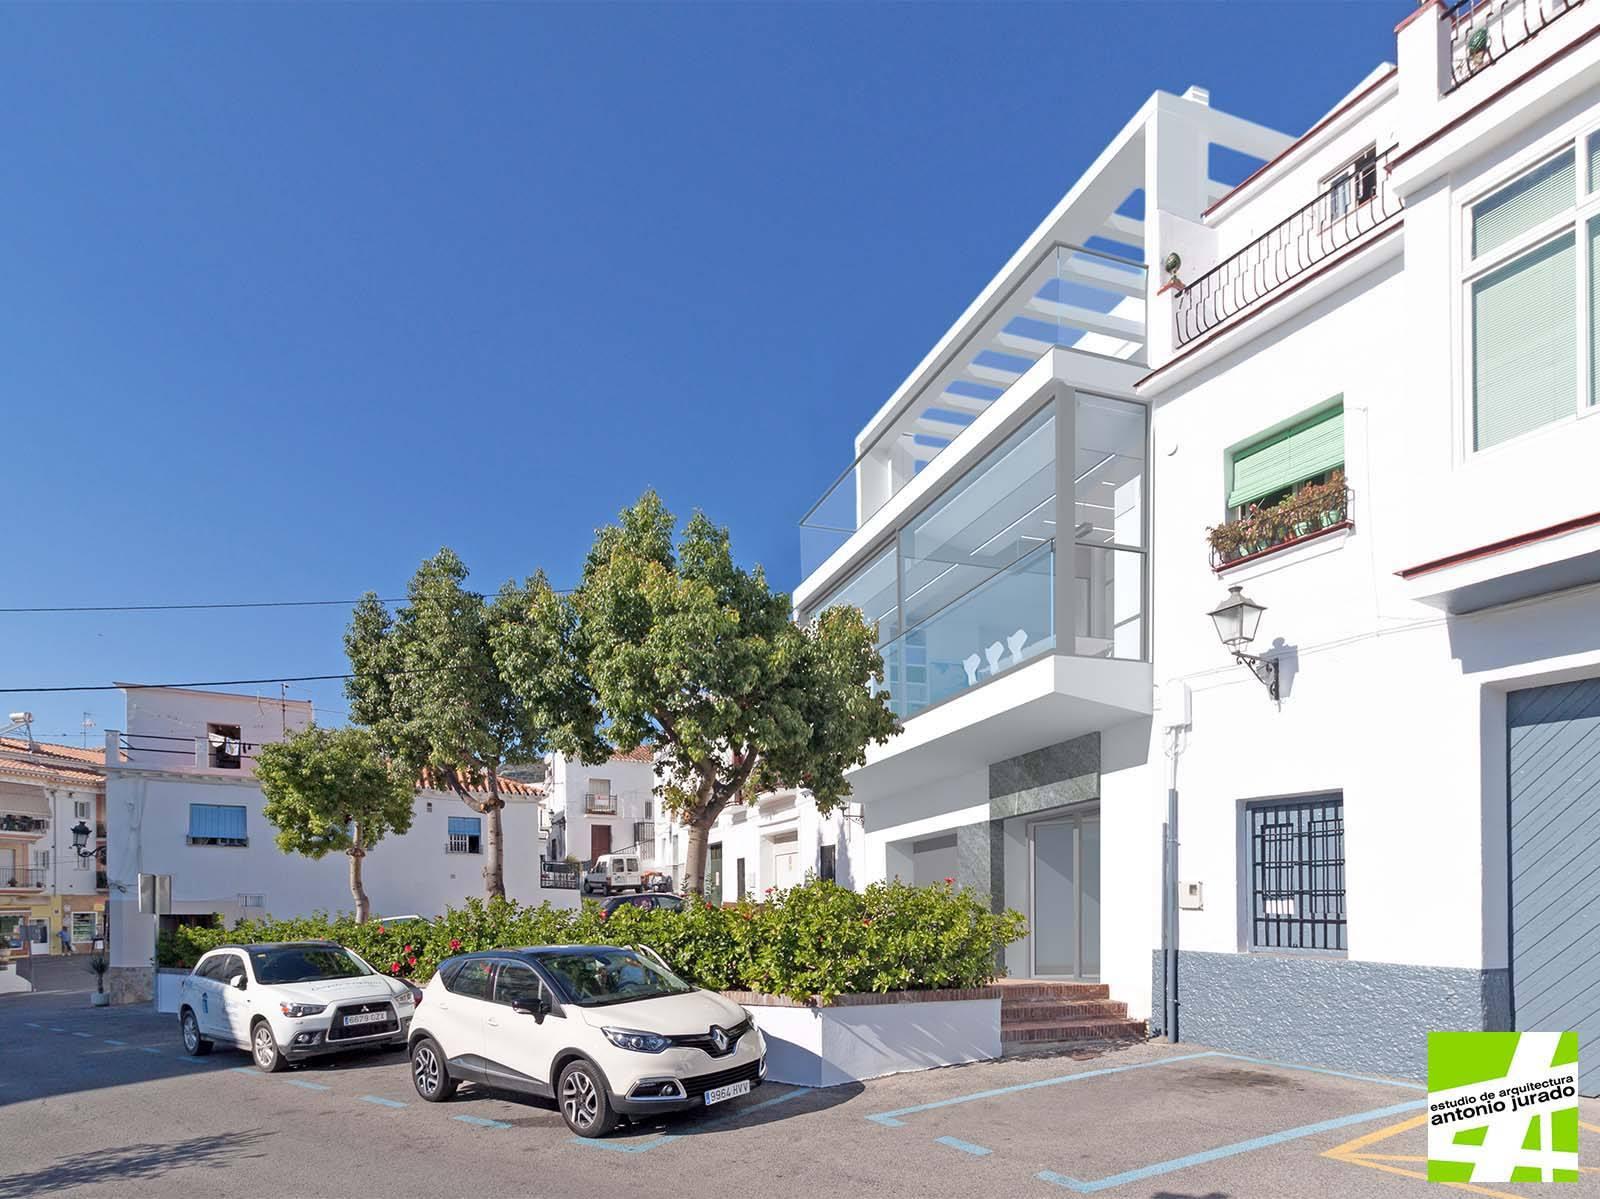 irene-sanchez-moreno-eldevenir-art-gallery-galeria-arte-online-torrox-malaga-contemporaneo-antonio-jurado-arquitectura (4).jpg